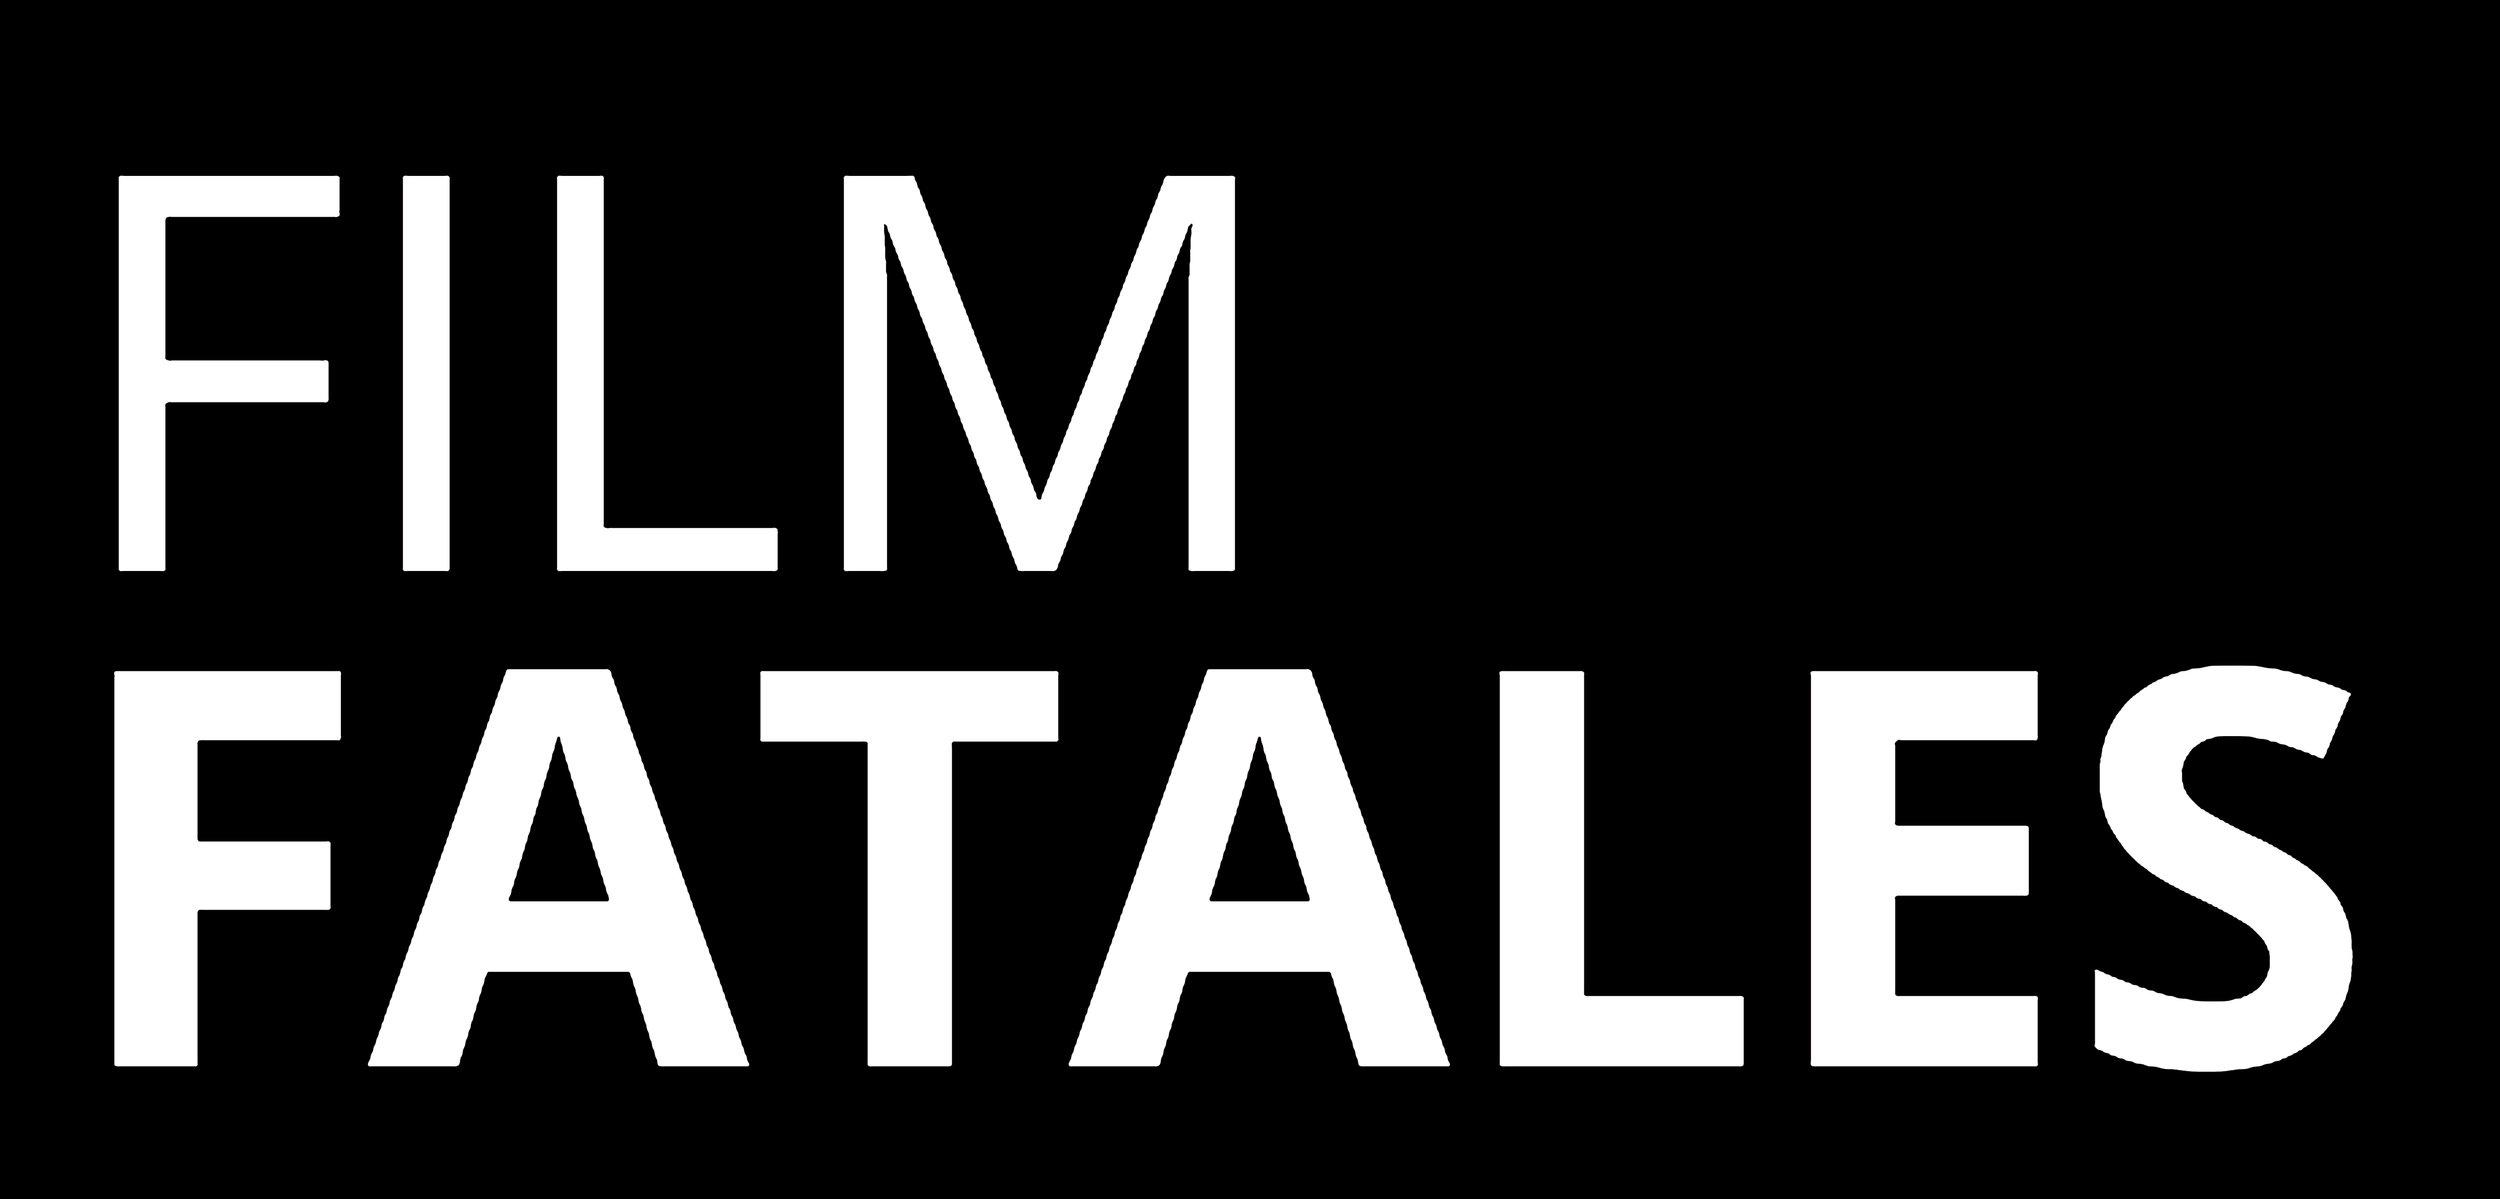 Film_Fatales_logo_inverted_bw.jpg